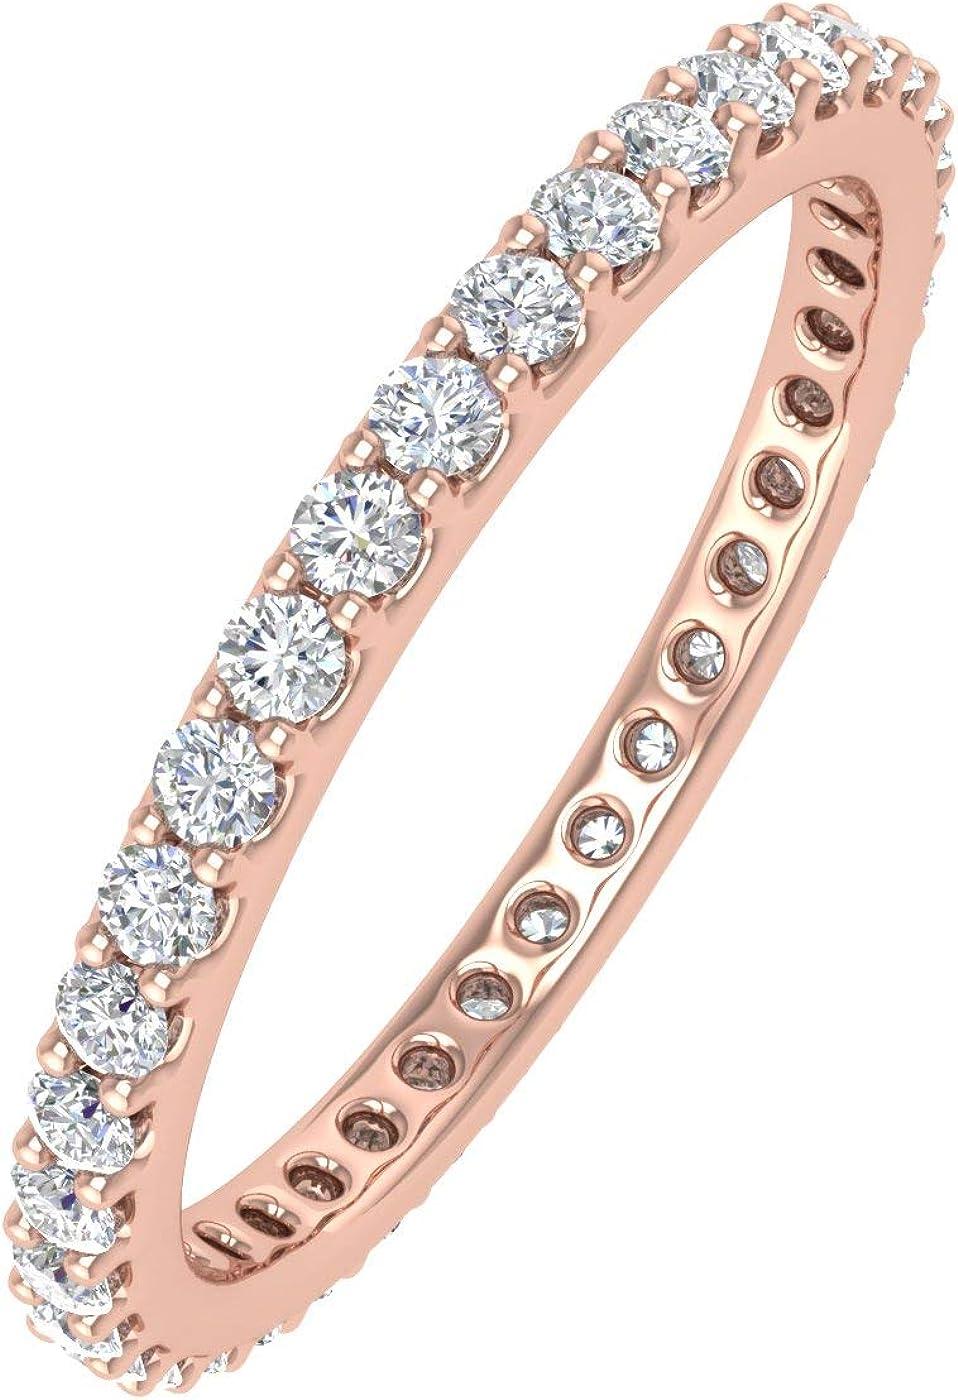 1/2 Carat to 0.51 Carat Diamond Eternity Wedding Band in 14K Gold